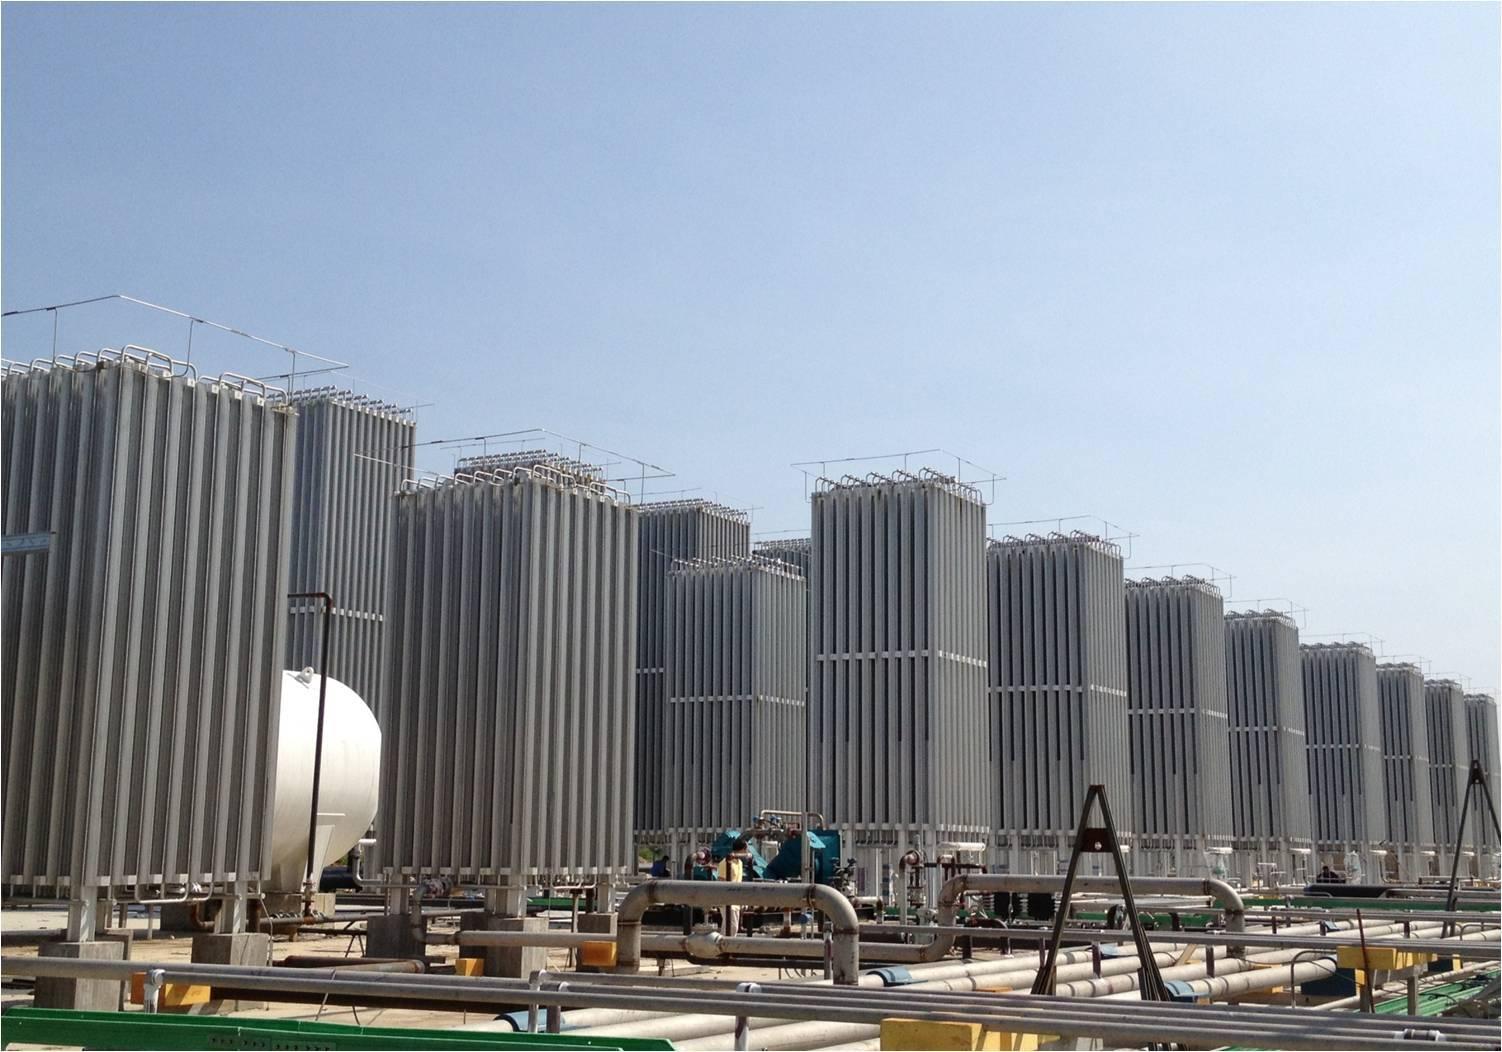 潮州港华三期LNG气化站项目2   LNG gas station project of Chaozhou Towngas III.jpg